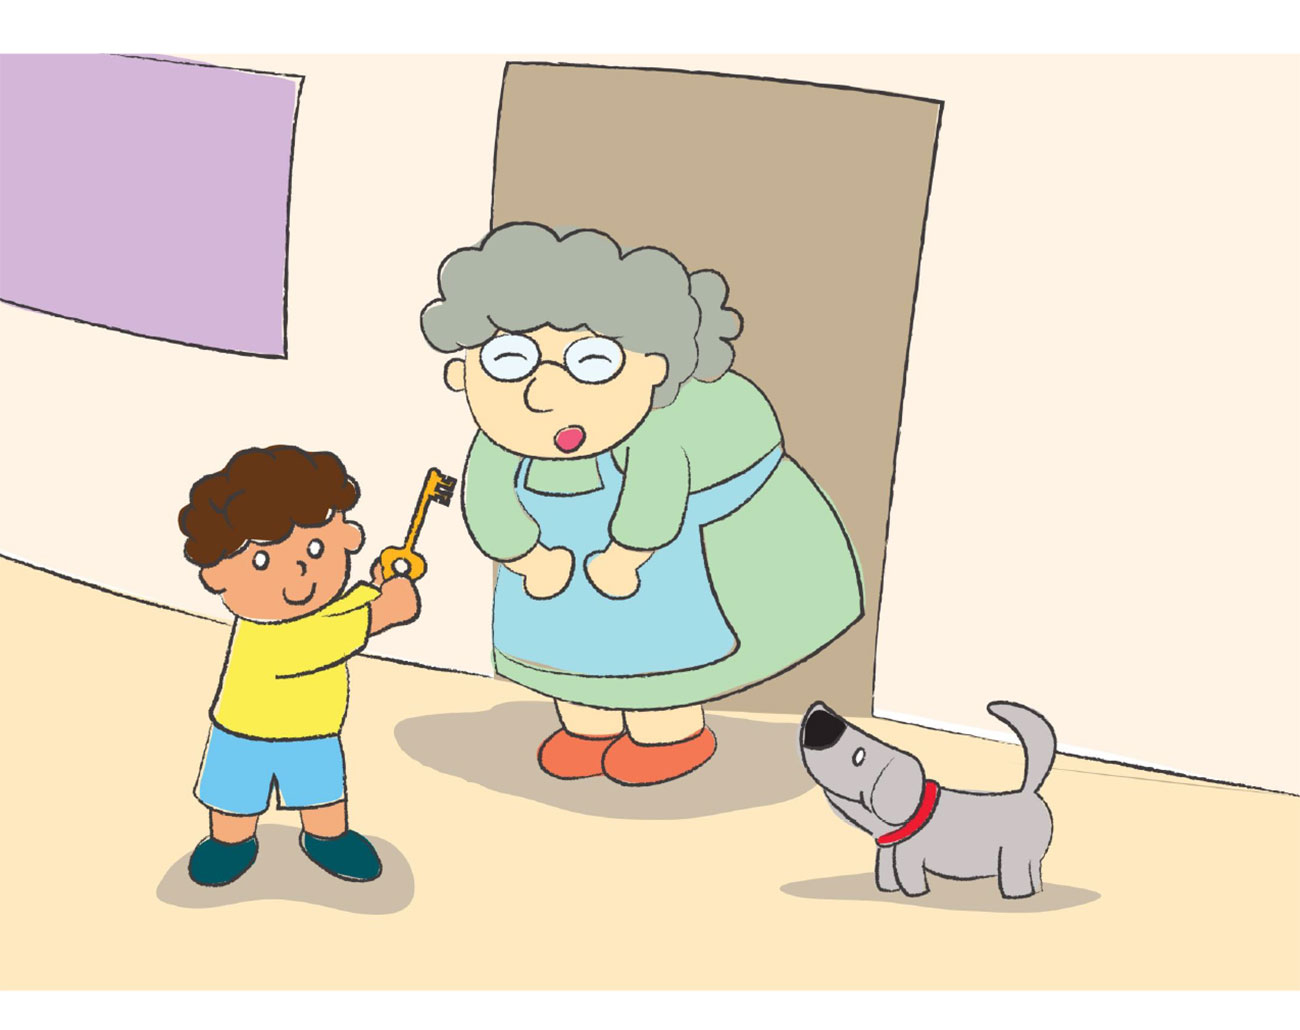 kids short story 'Down the memory lane with nash' by uma bala devarakonda - page 7